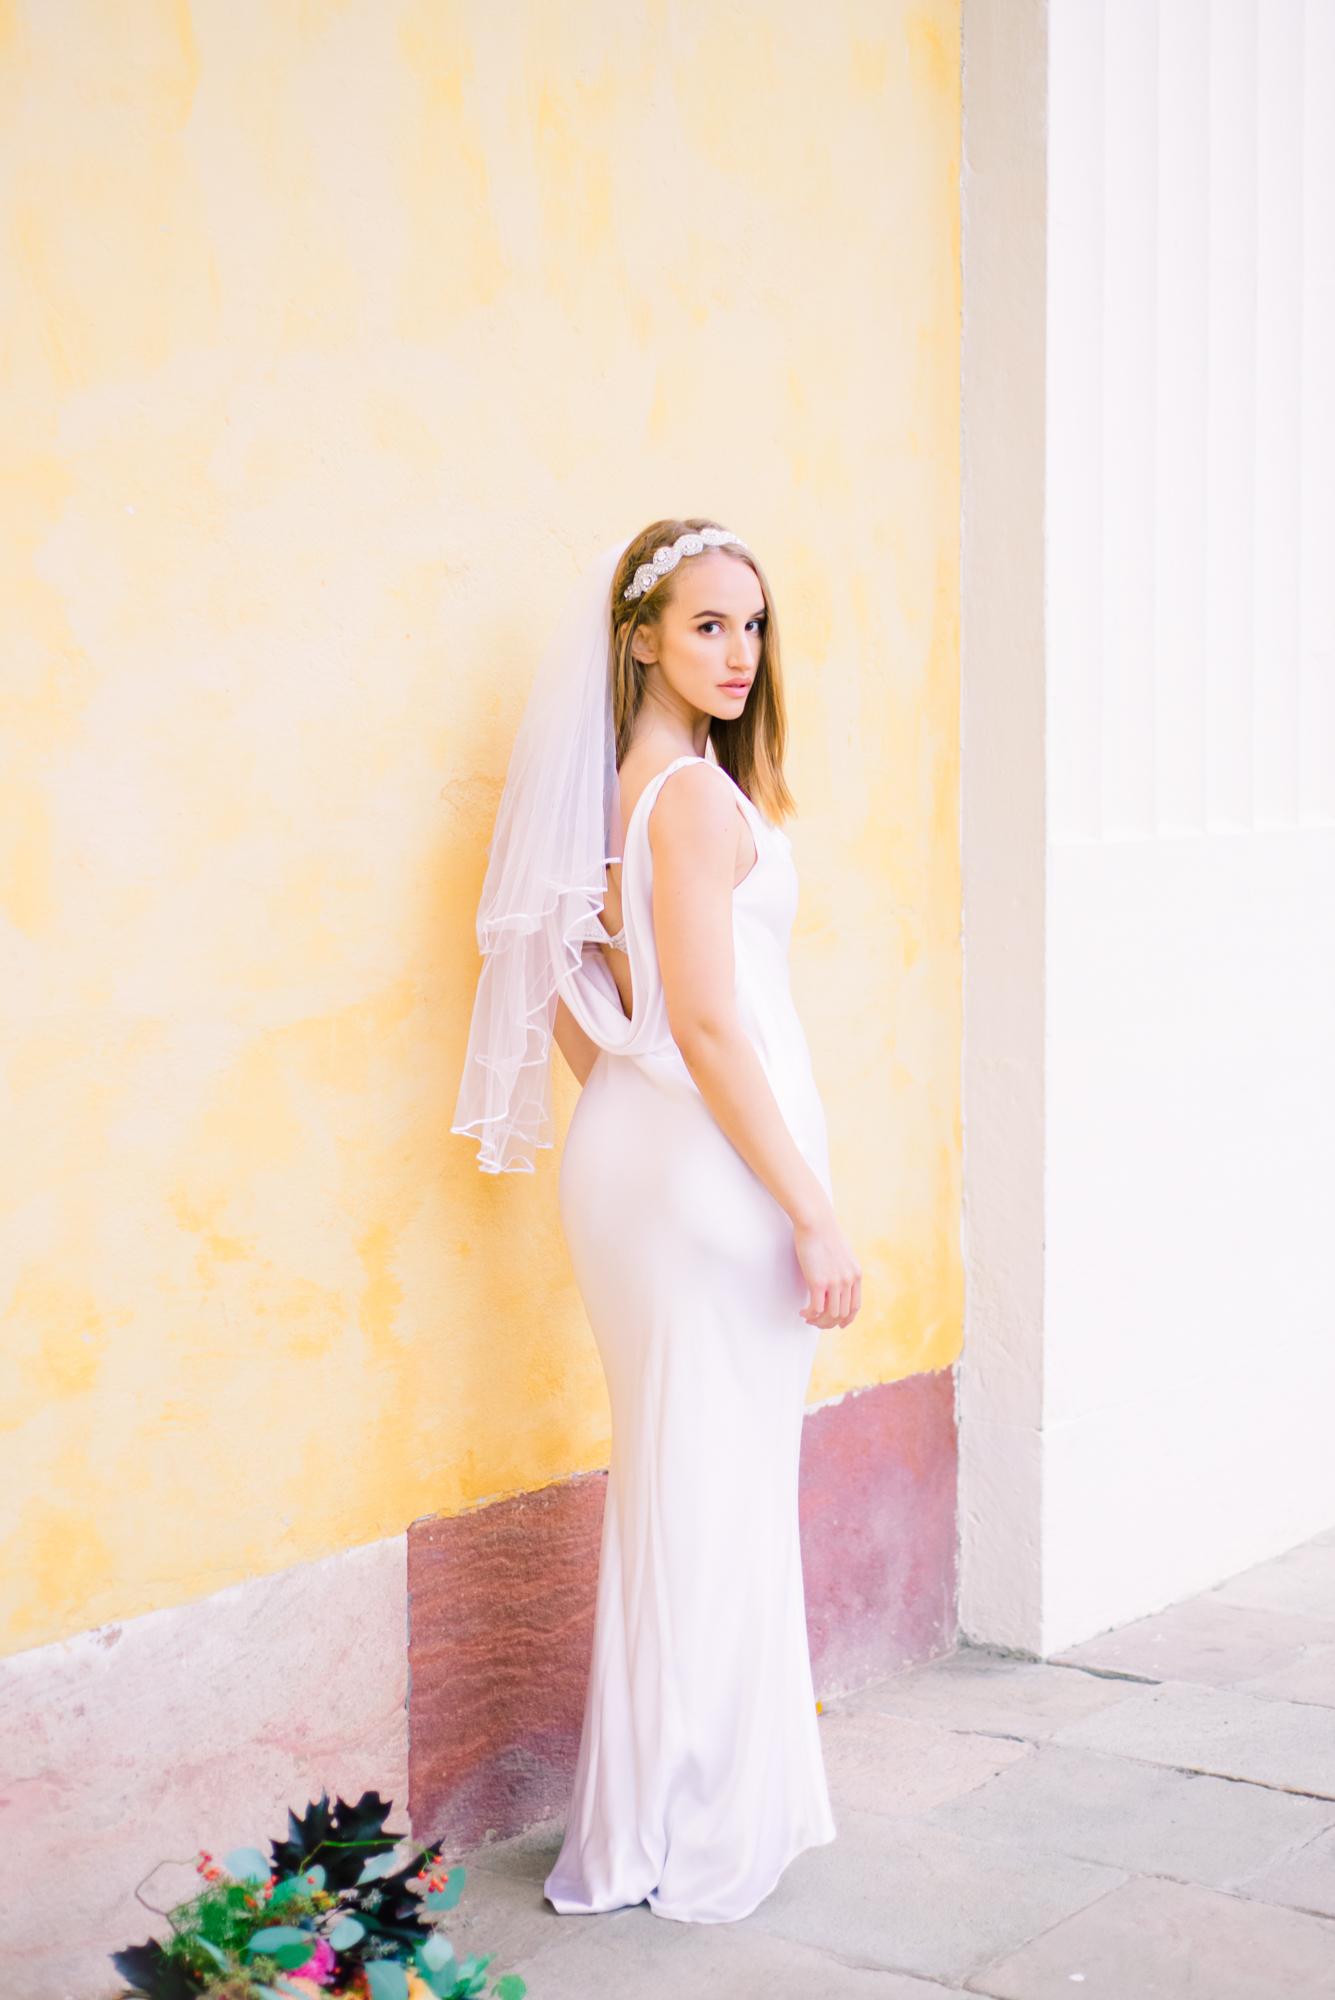 Elegant Organic Fall Swedish Bridal Wedding Styled Shoot - Erika Alvarenga Photography-111.jpg